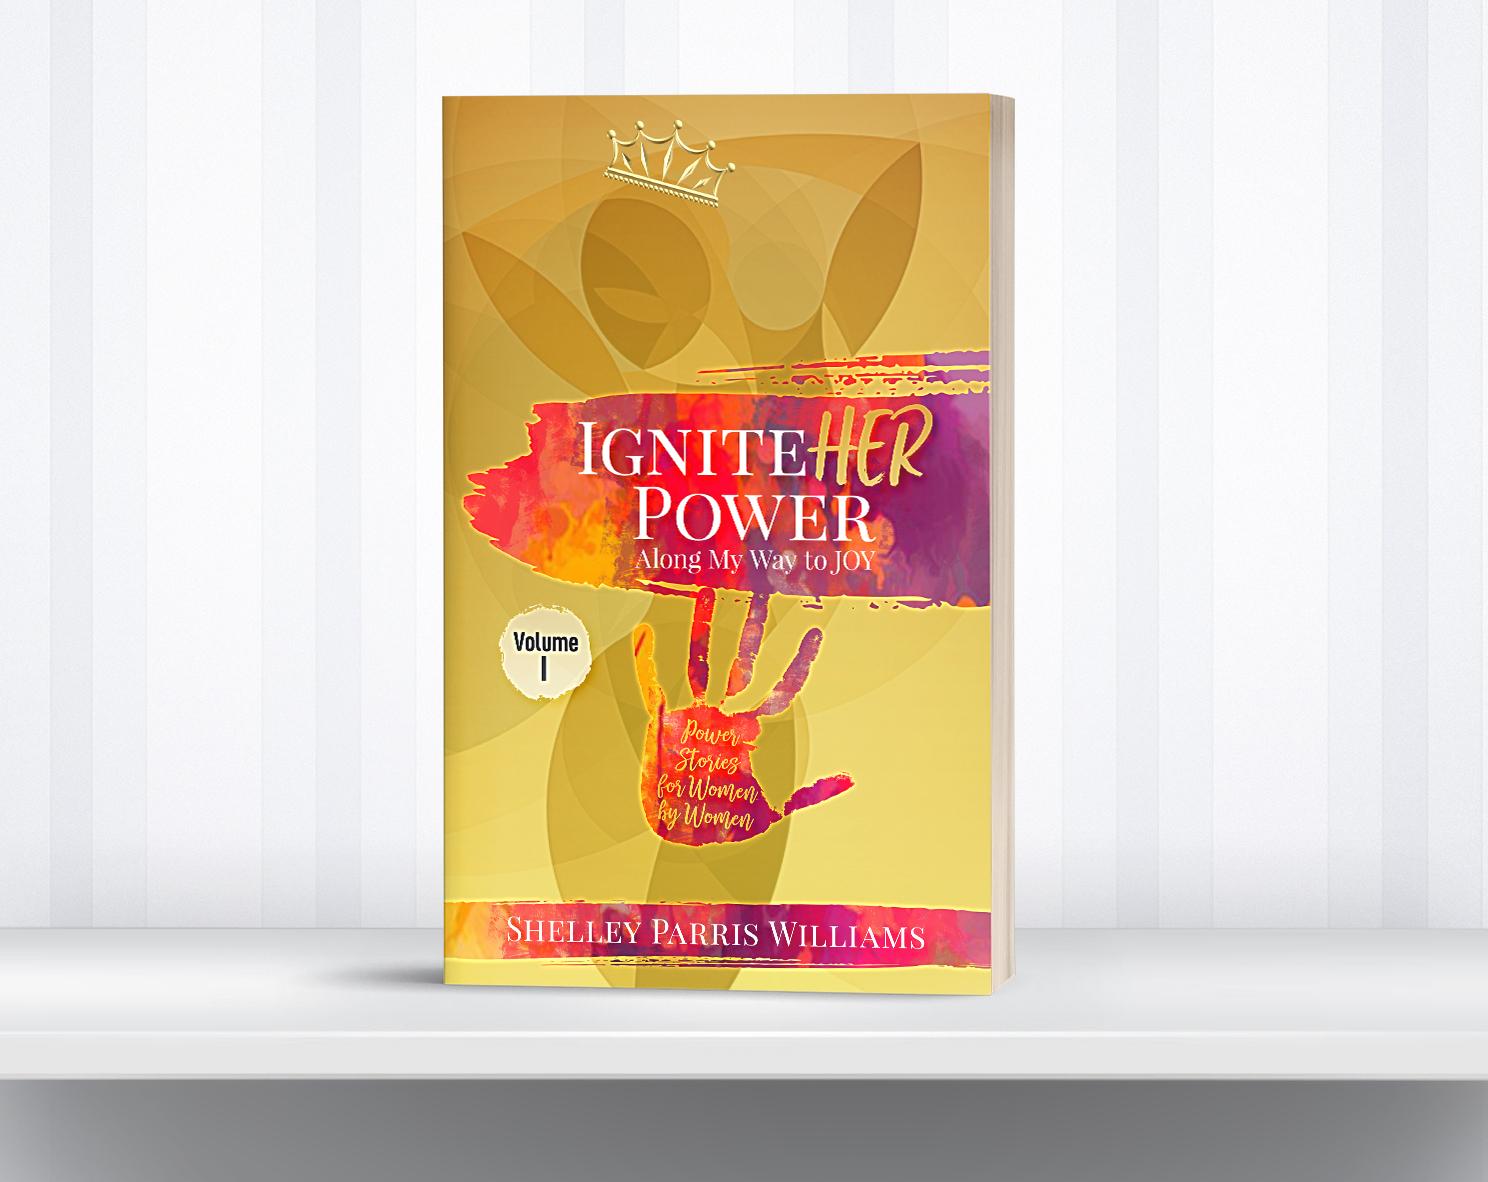 IgniteHER Power: Along My Way to JOY - Volume I. 0000